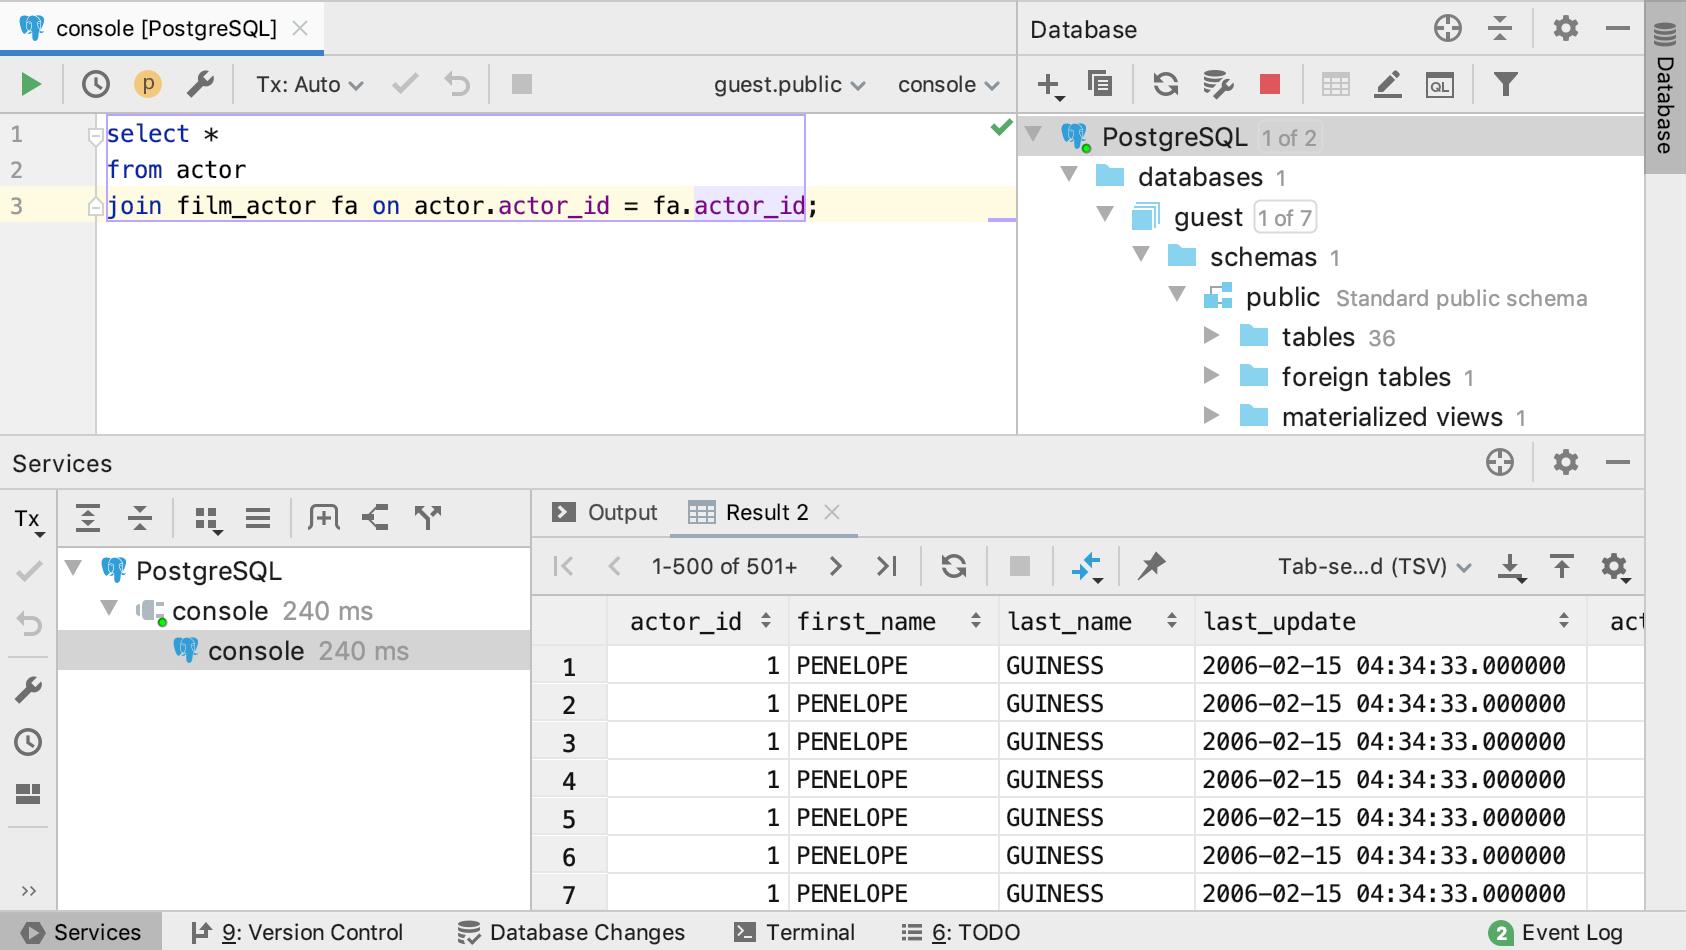 Data editor - Help | PyCharm